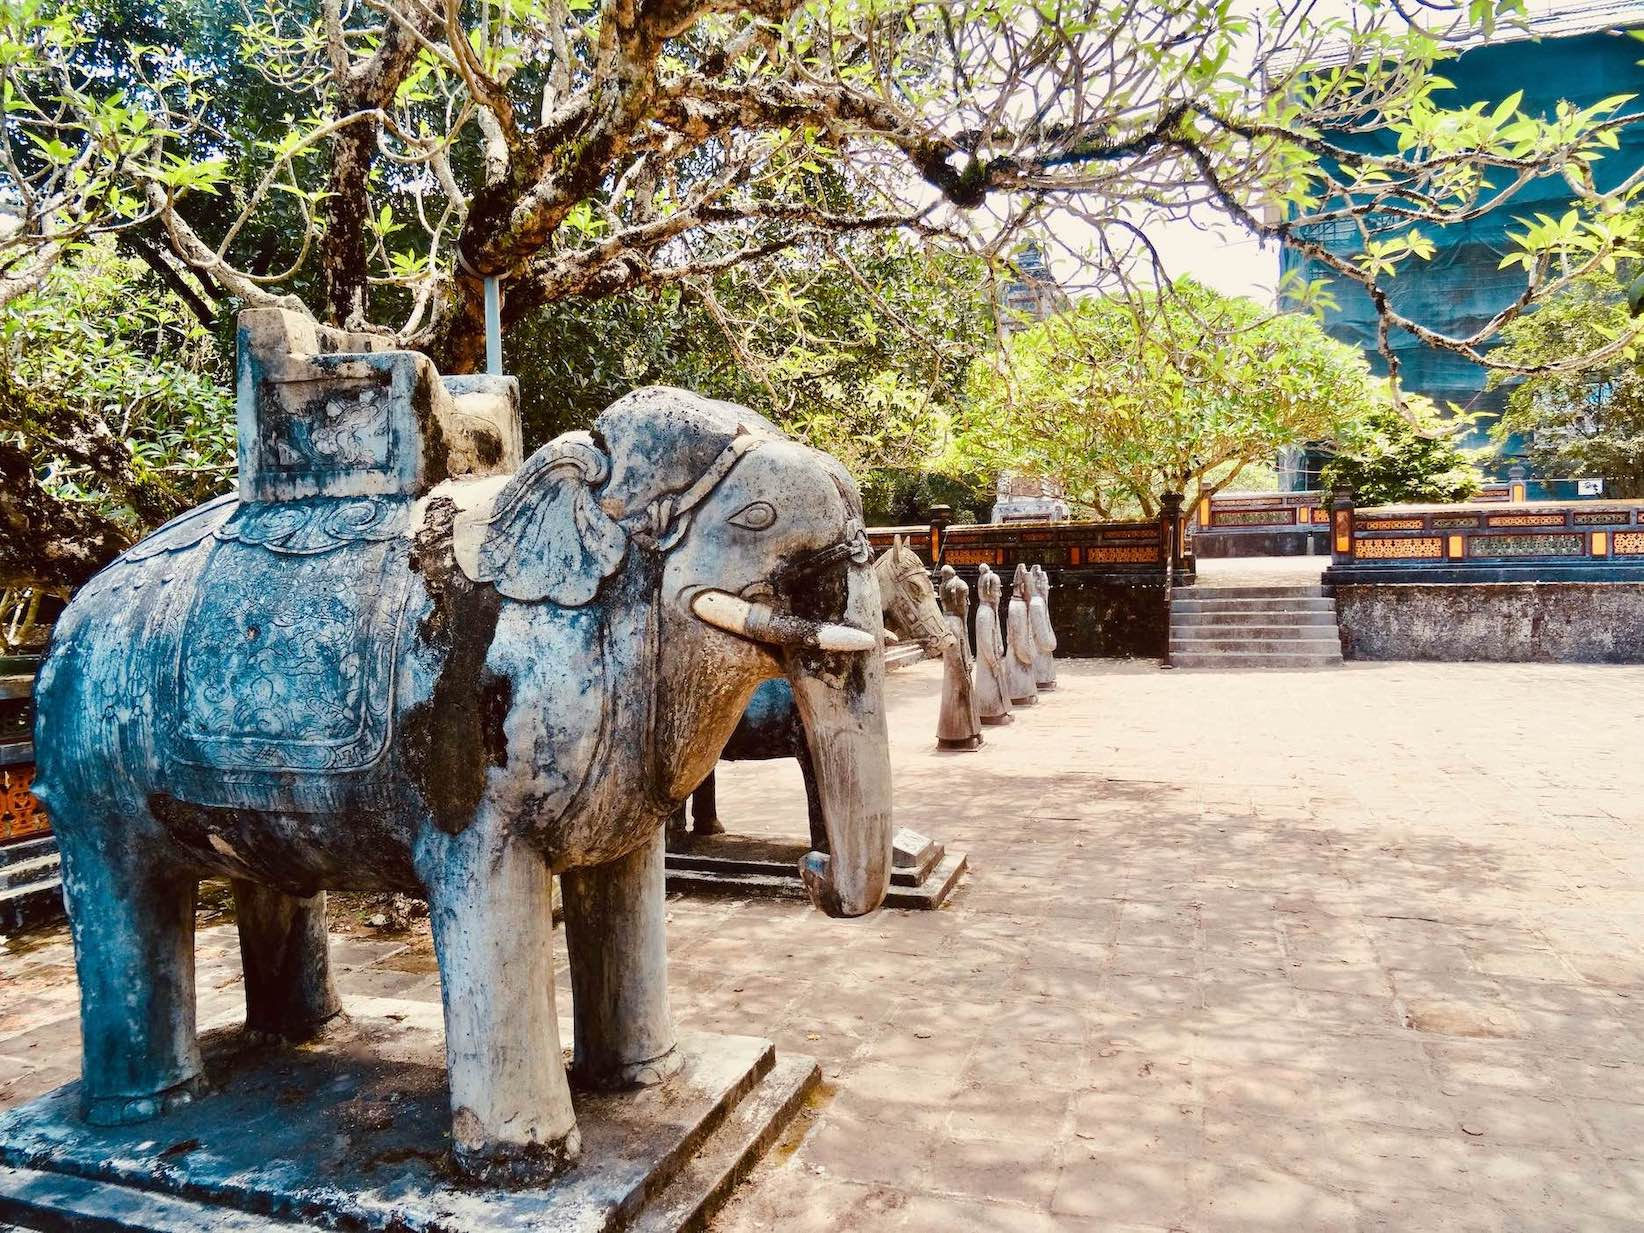 Elephant statues Mausoleum of Emperor Tu Duc